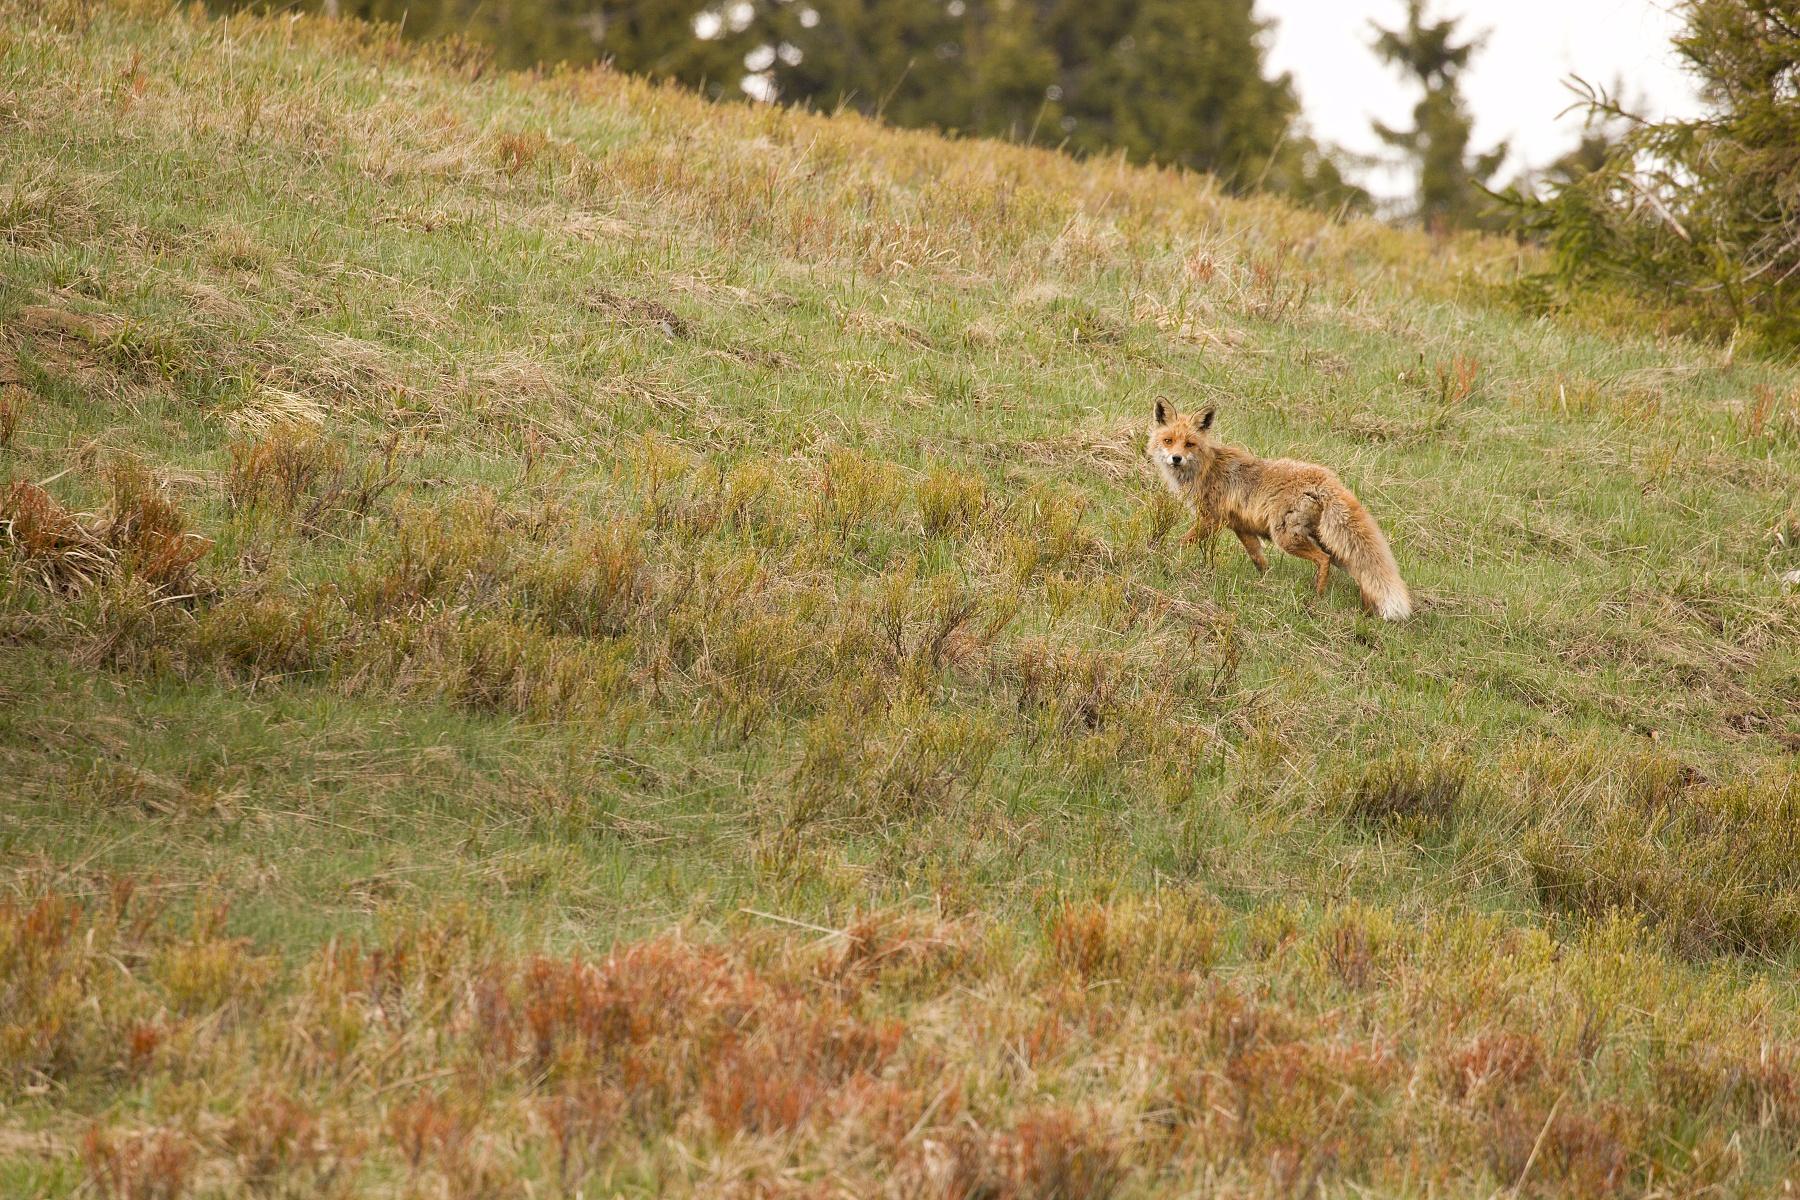 líška hrdzavá (Vulpes vulpes) Red fox, Veľká Fatra, Slovensko Canon EOS 6D mark II, Canon 100-400 mm f4.5-5.6 L IS II USM, 400 mm, f8, 1/400, ISO 640, 16. máj 2020